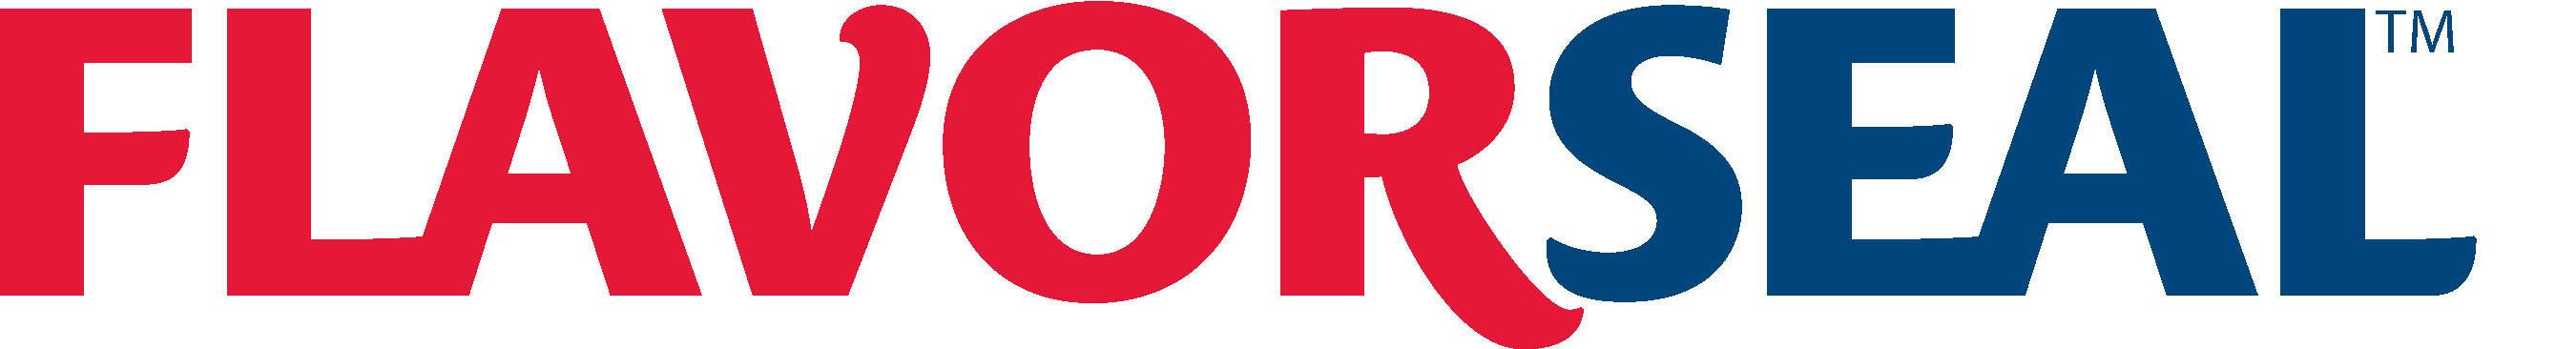 Flavorseal Corporate Logo. (PRNewsFoto/Flavorseal) (PRNewsFoto/)